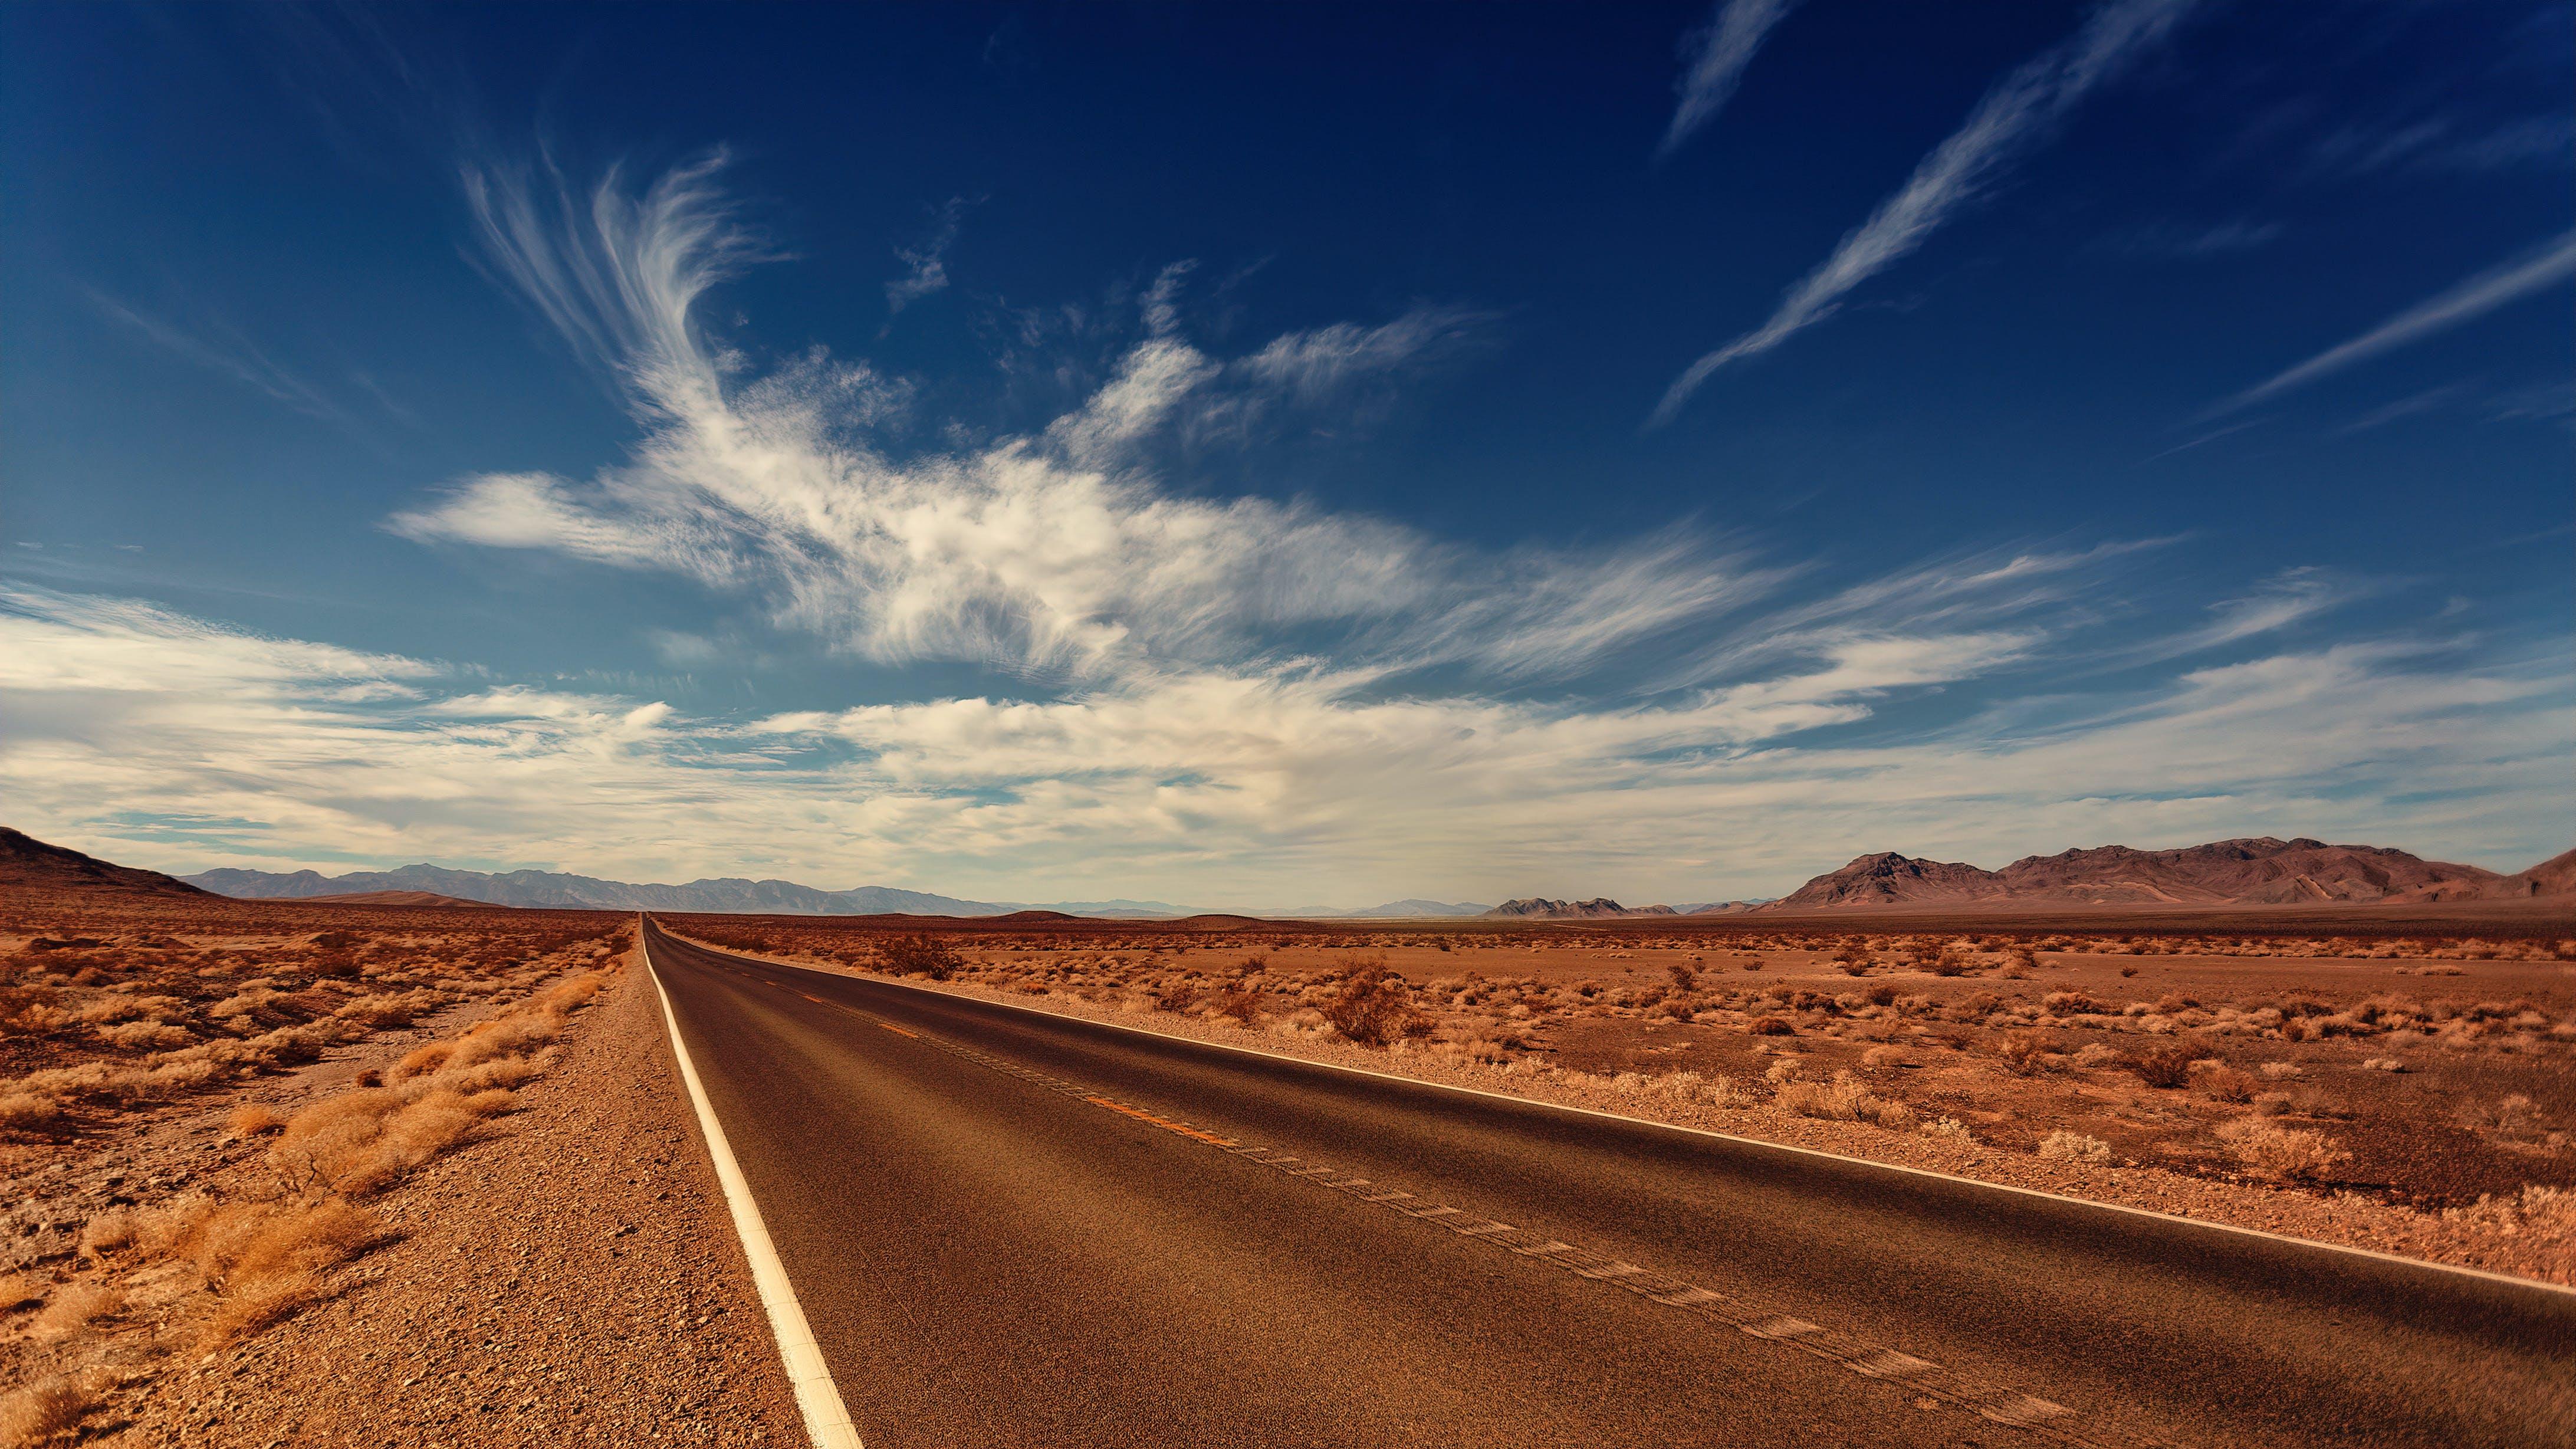 Asphalt Road Under White Clouds